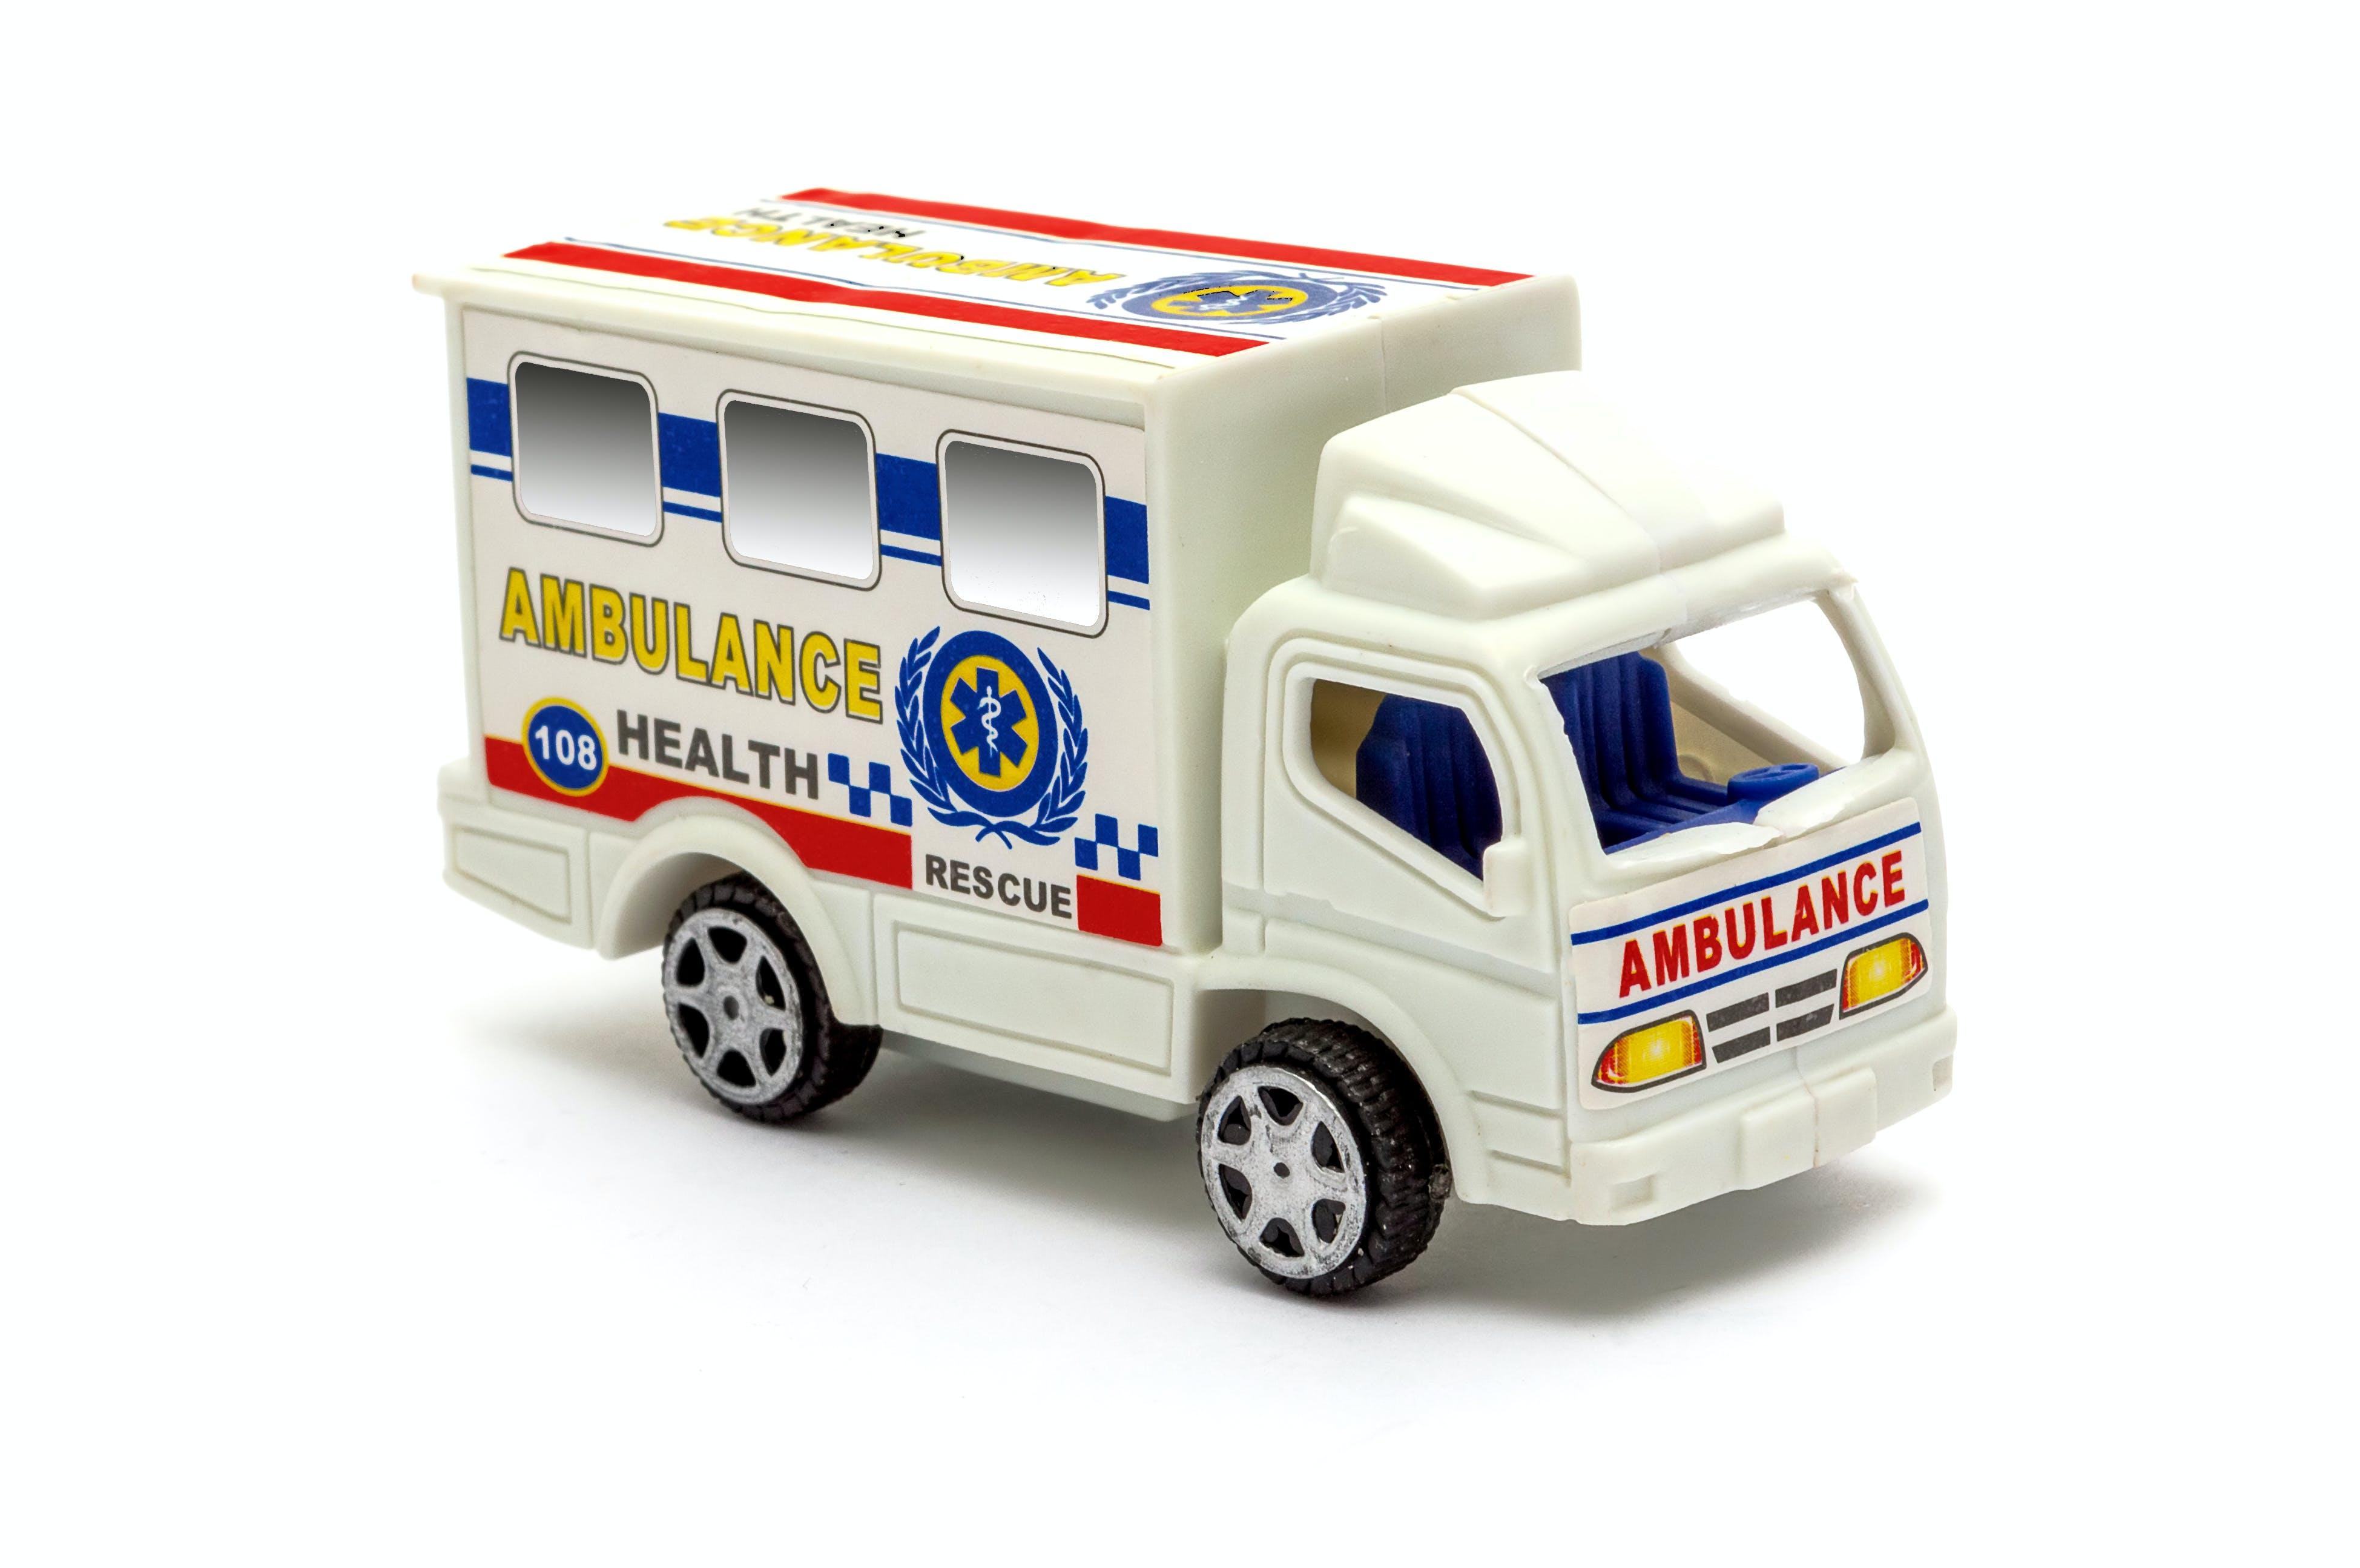 ambulance, icon, red cross